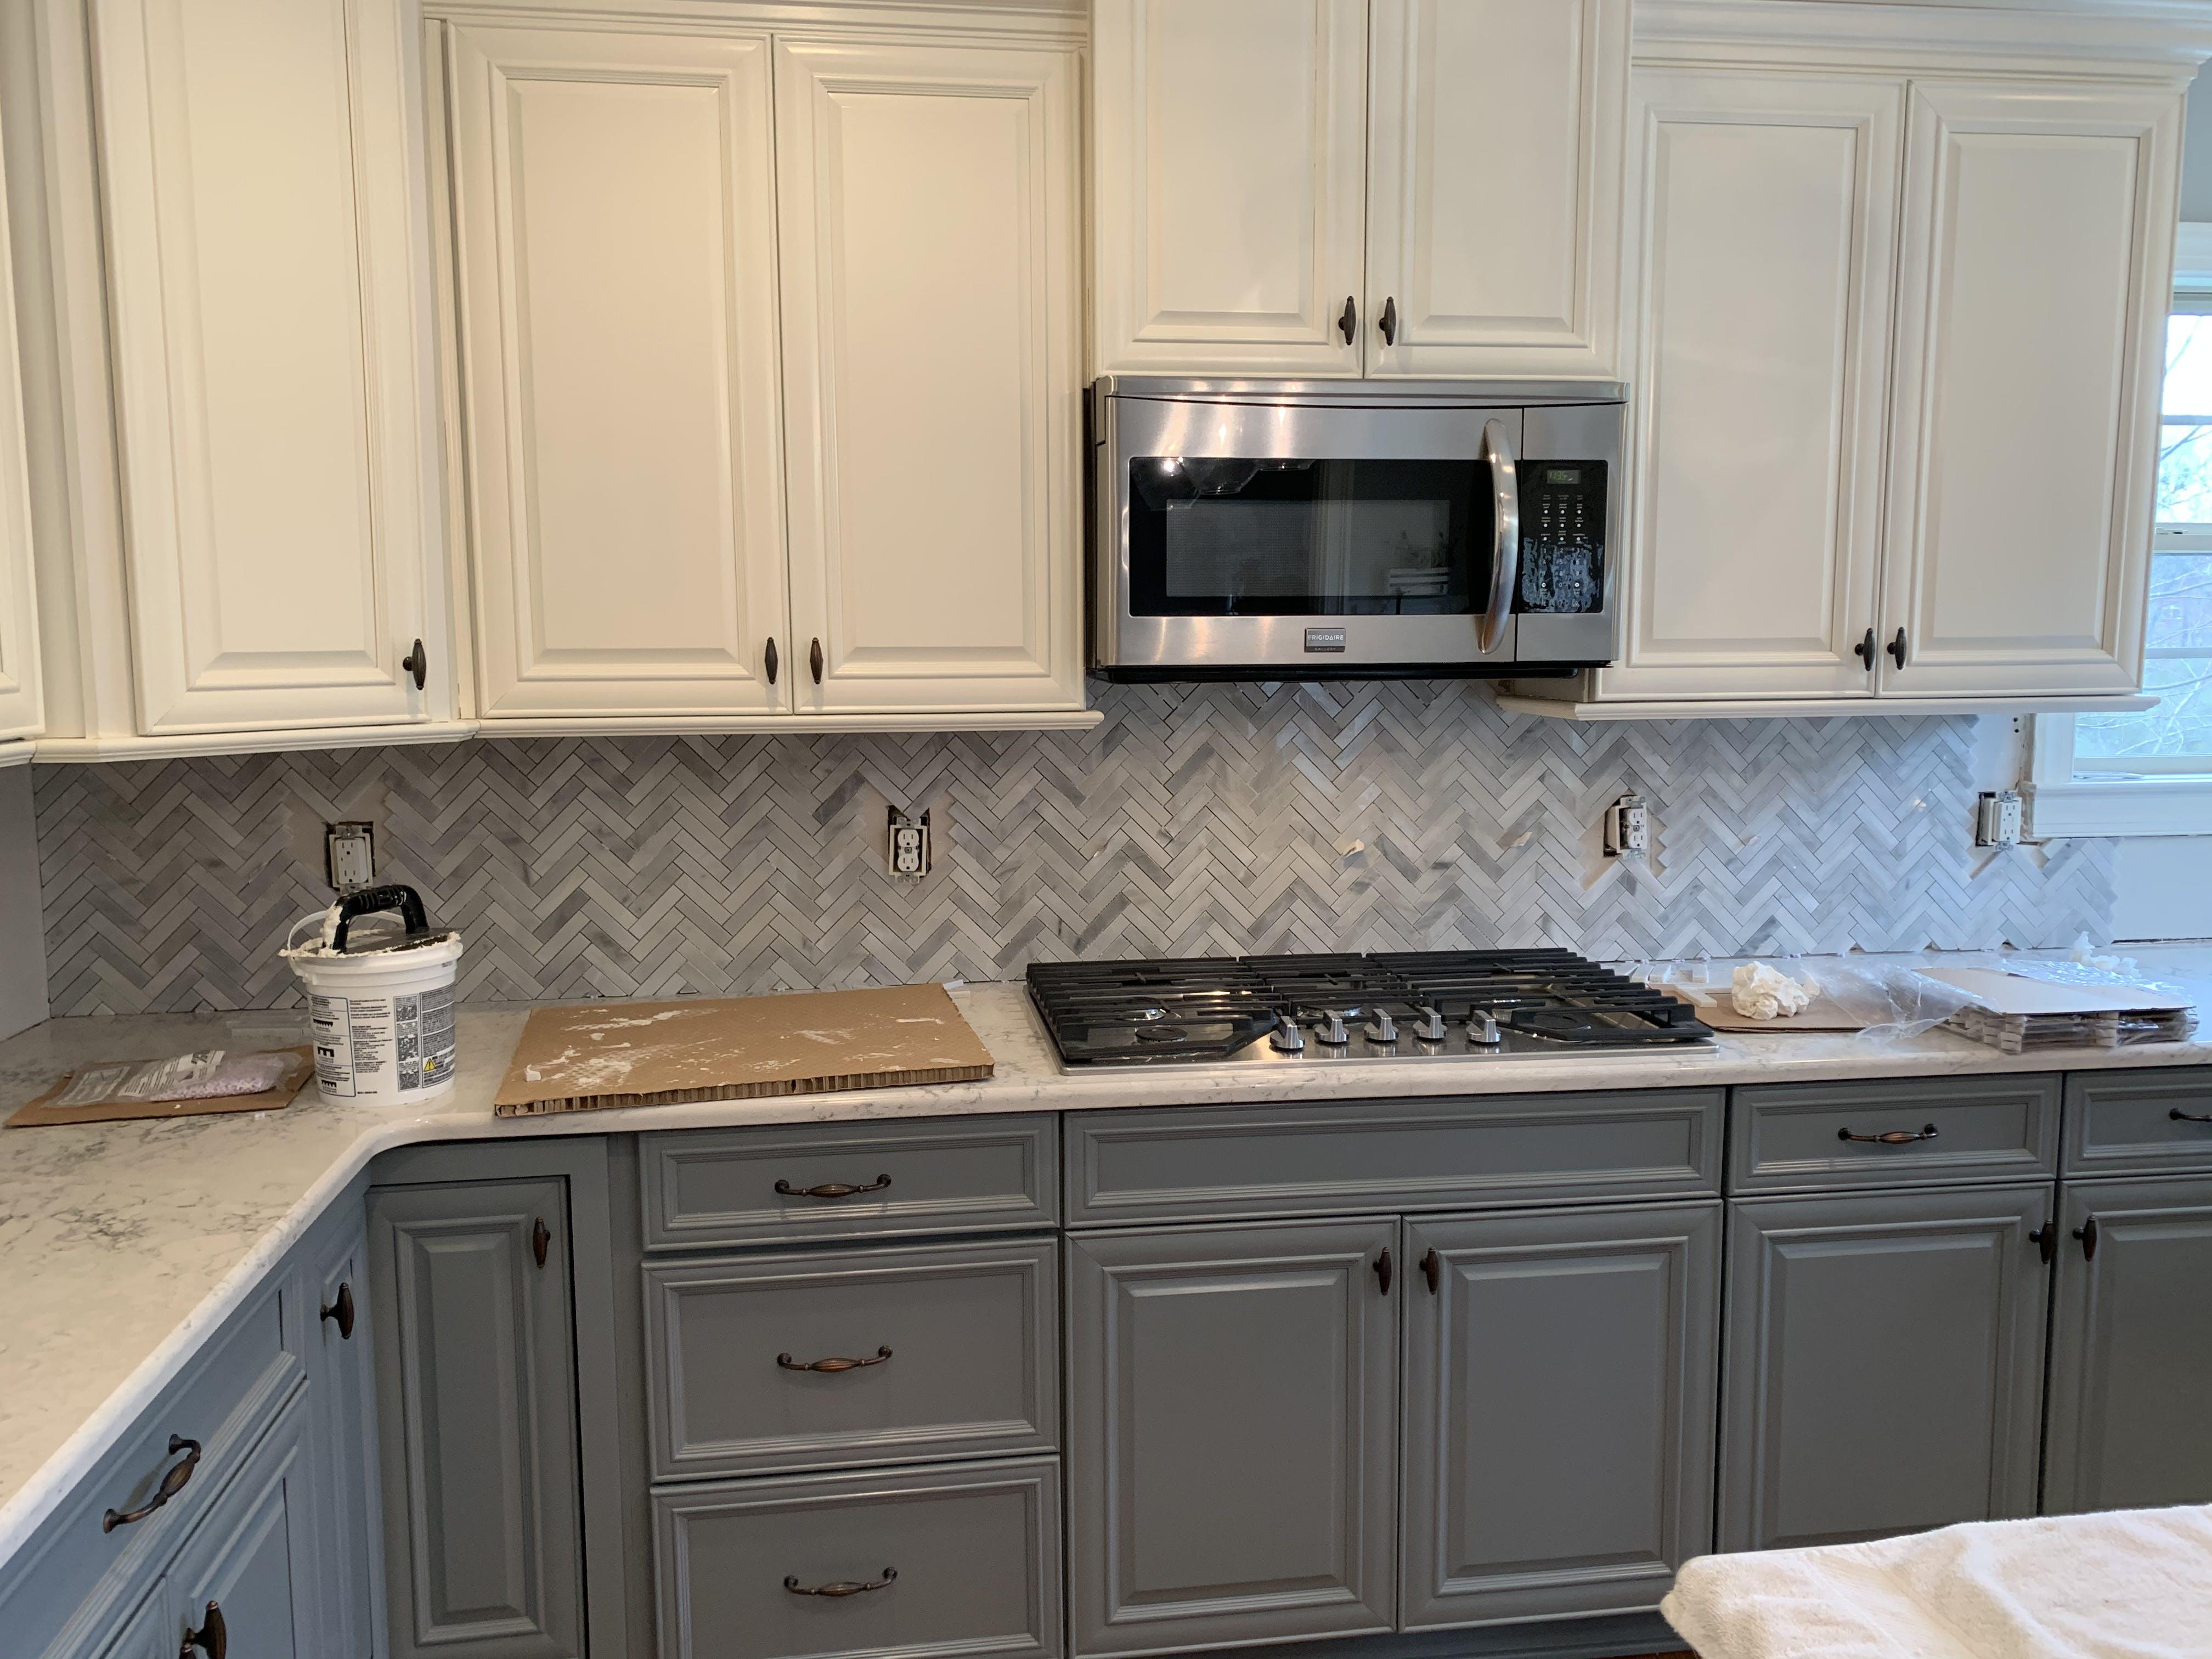 Carrara Bianco 1x4 Herringbone Marble Mosaic Tile Honed Polished Budgetmarble Com Budget Marble